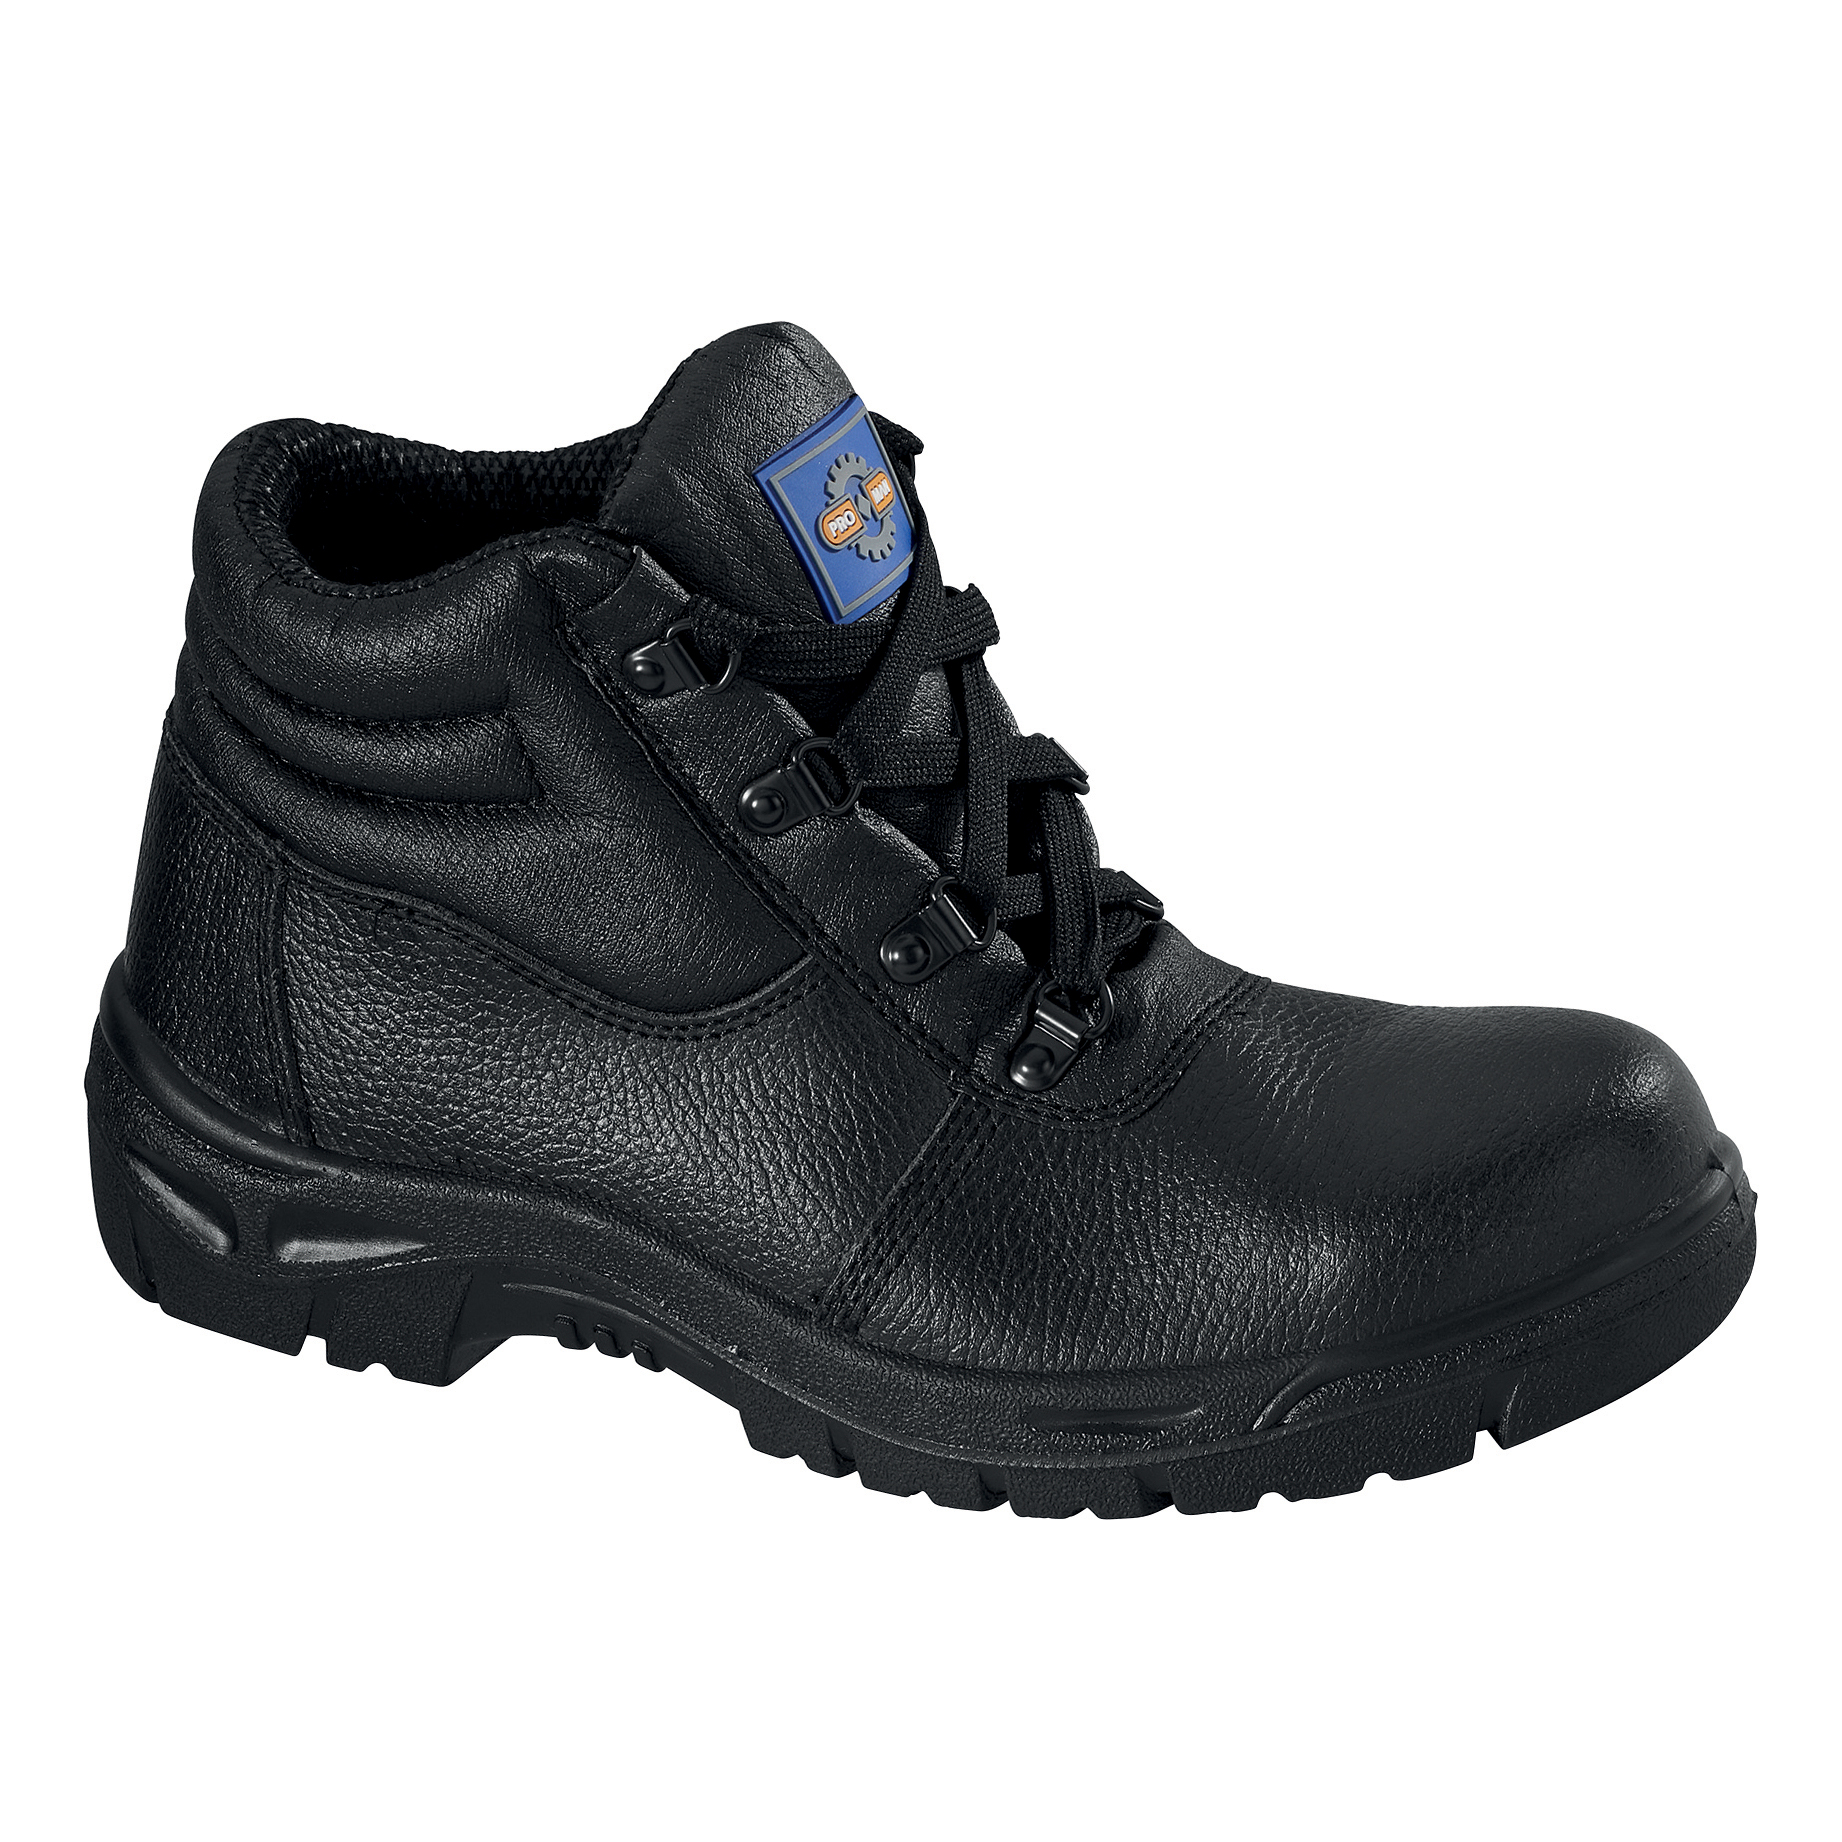 Rockfall ProMan Chukka Boot Leather Steel Toecap Black Size 14 Ref PM100 14